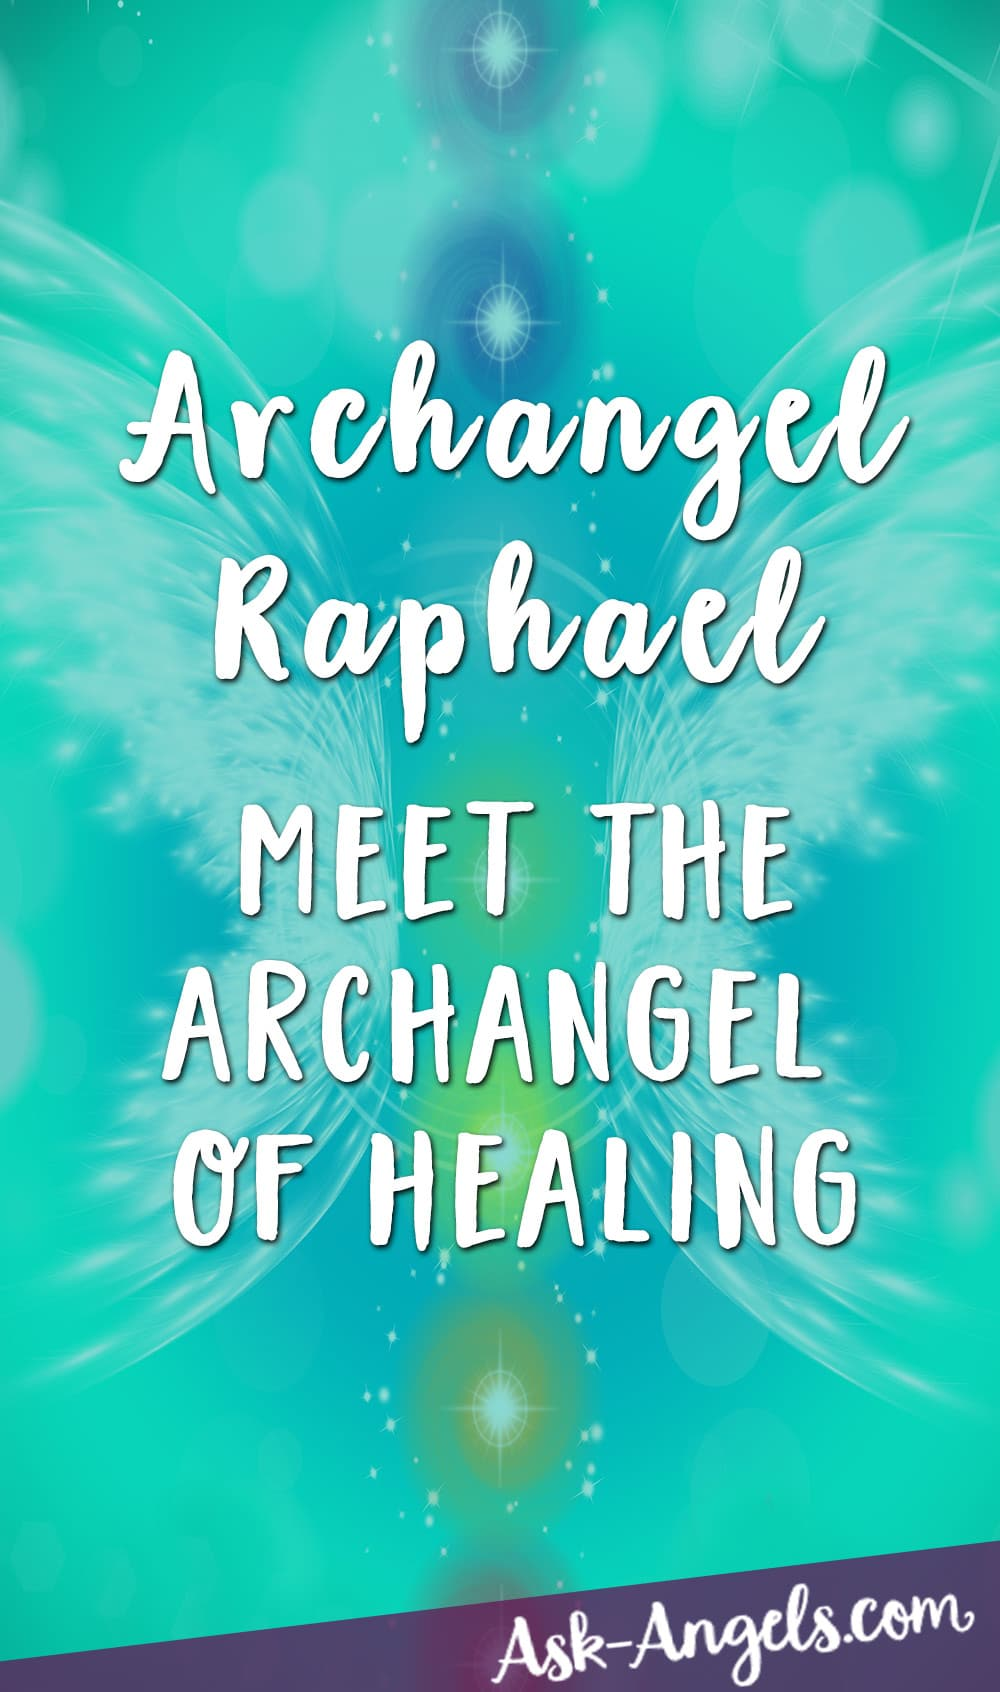 Archangel Raphael- The Archangel of Healing